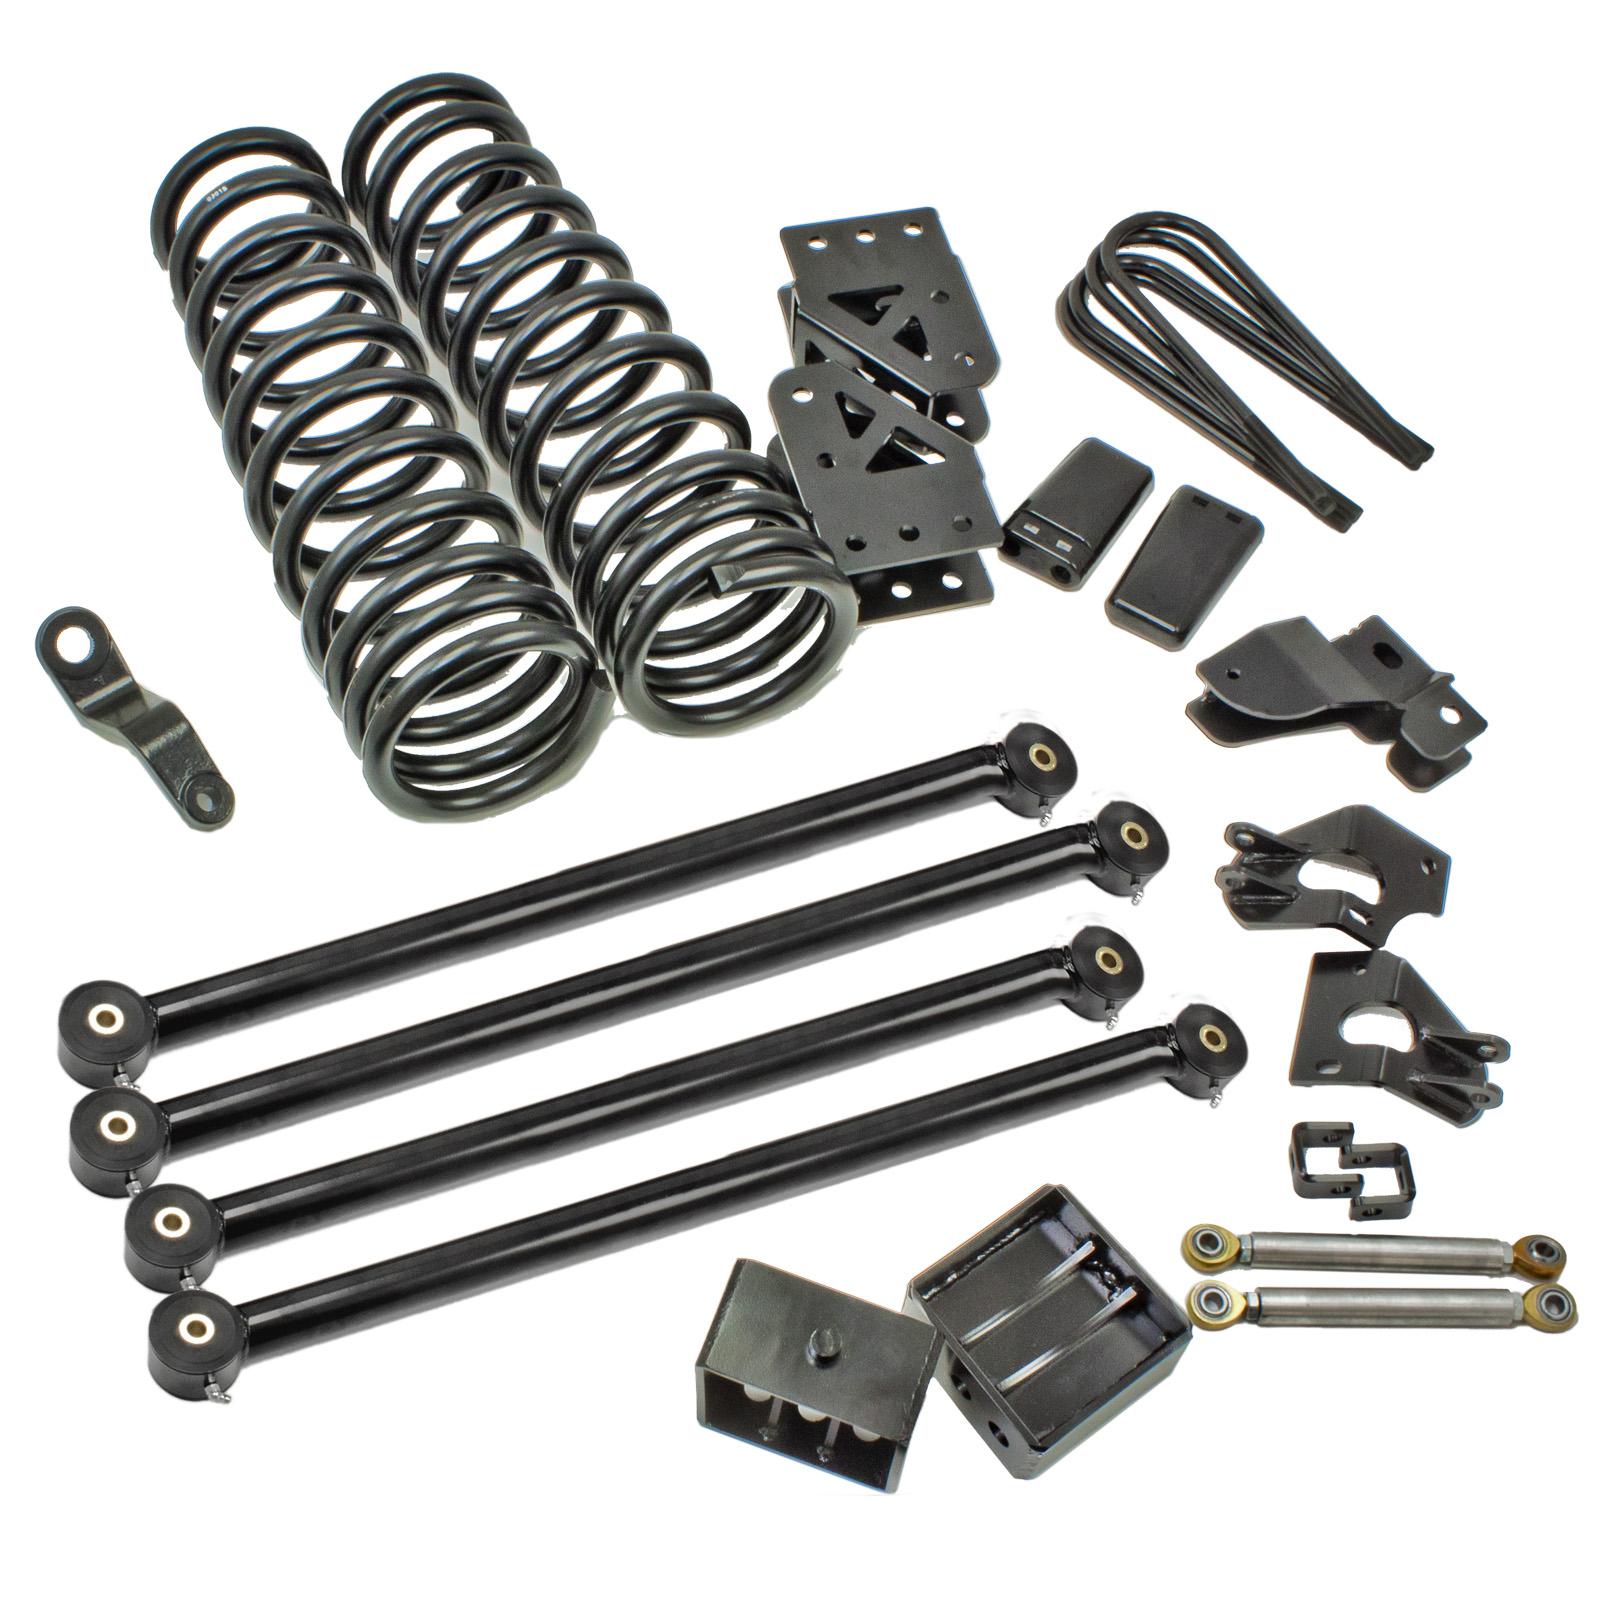 Dodge Lift Kit For 2010 Dodge Ram 3500 Truck Lift Kits